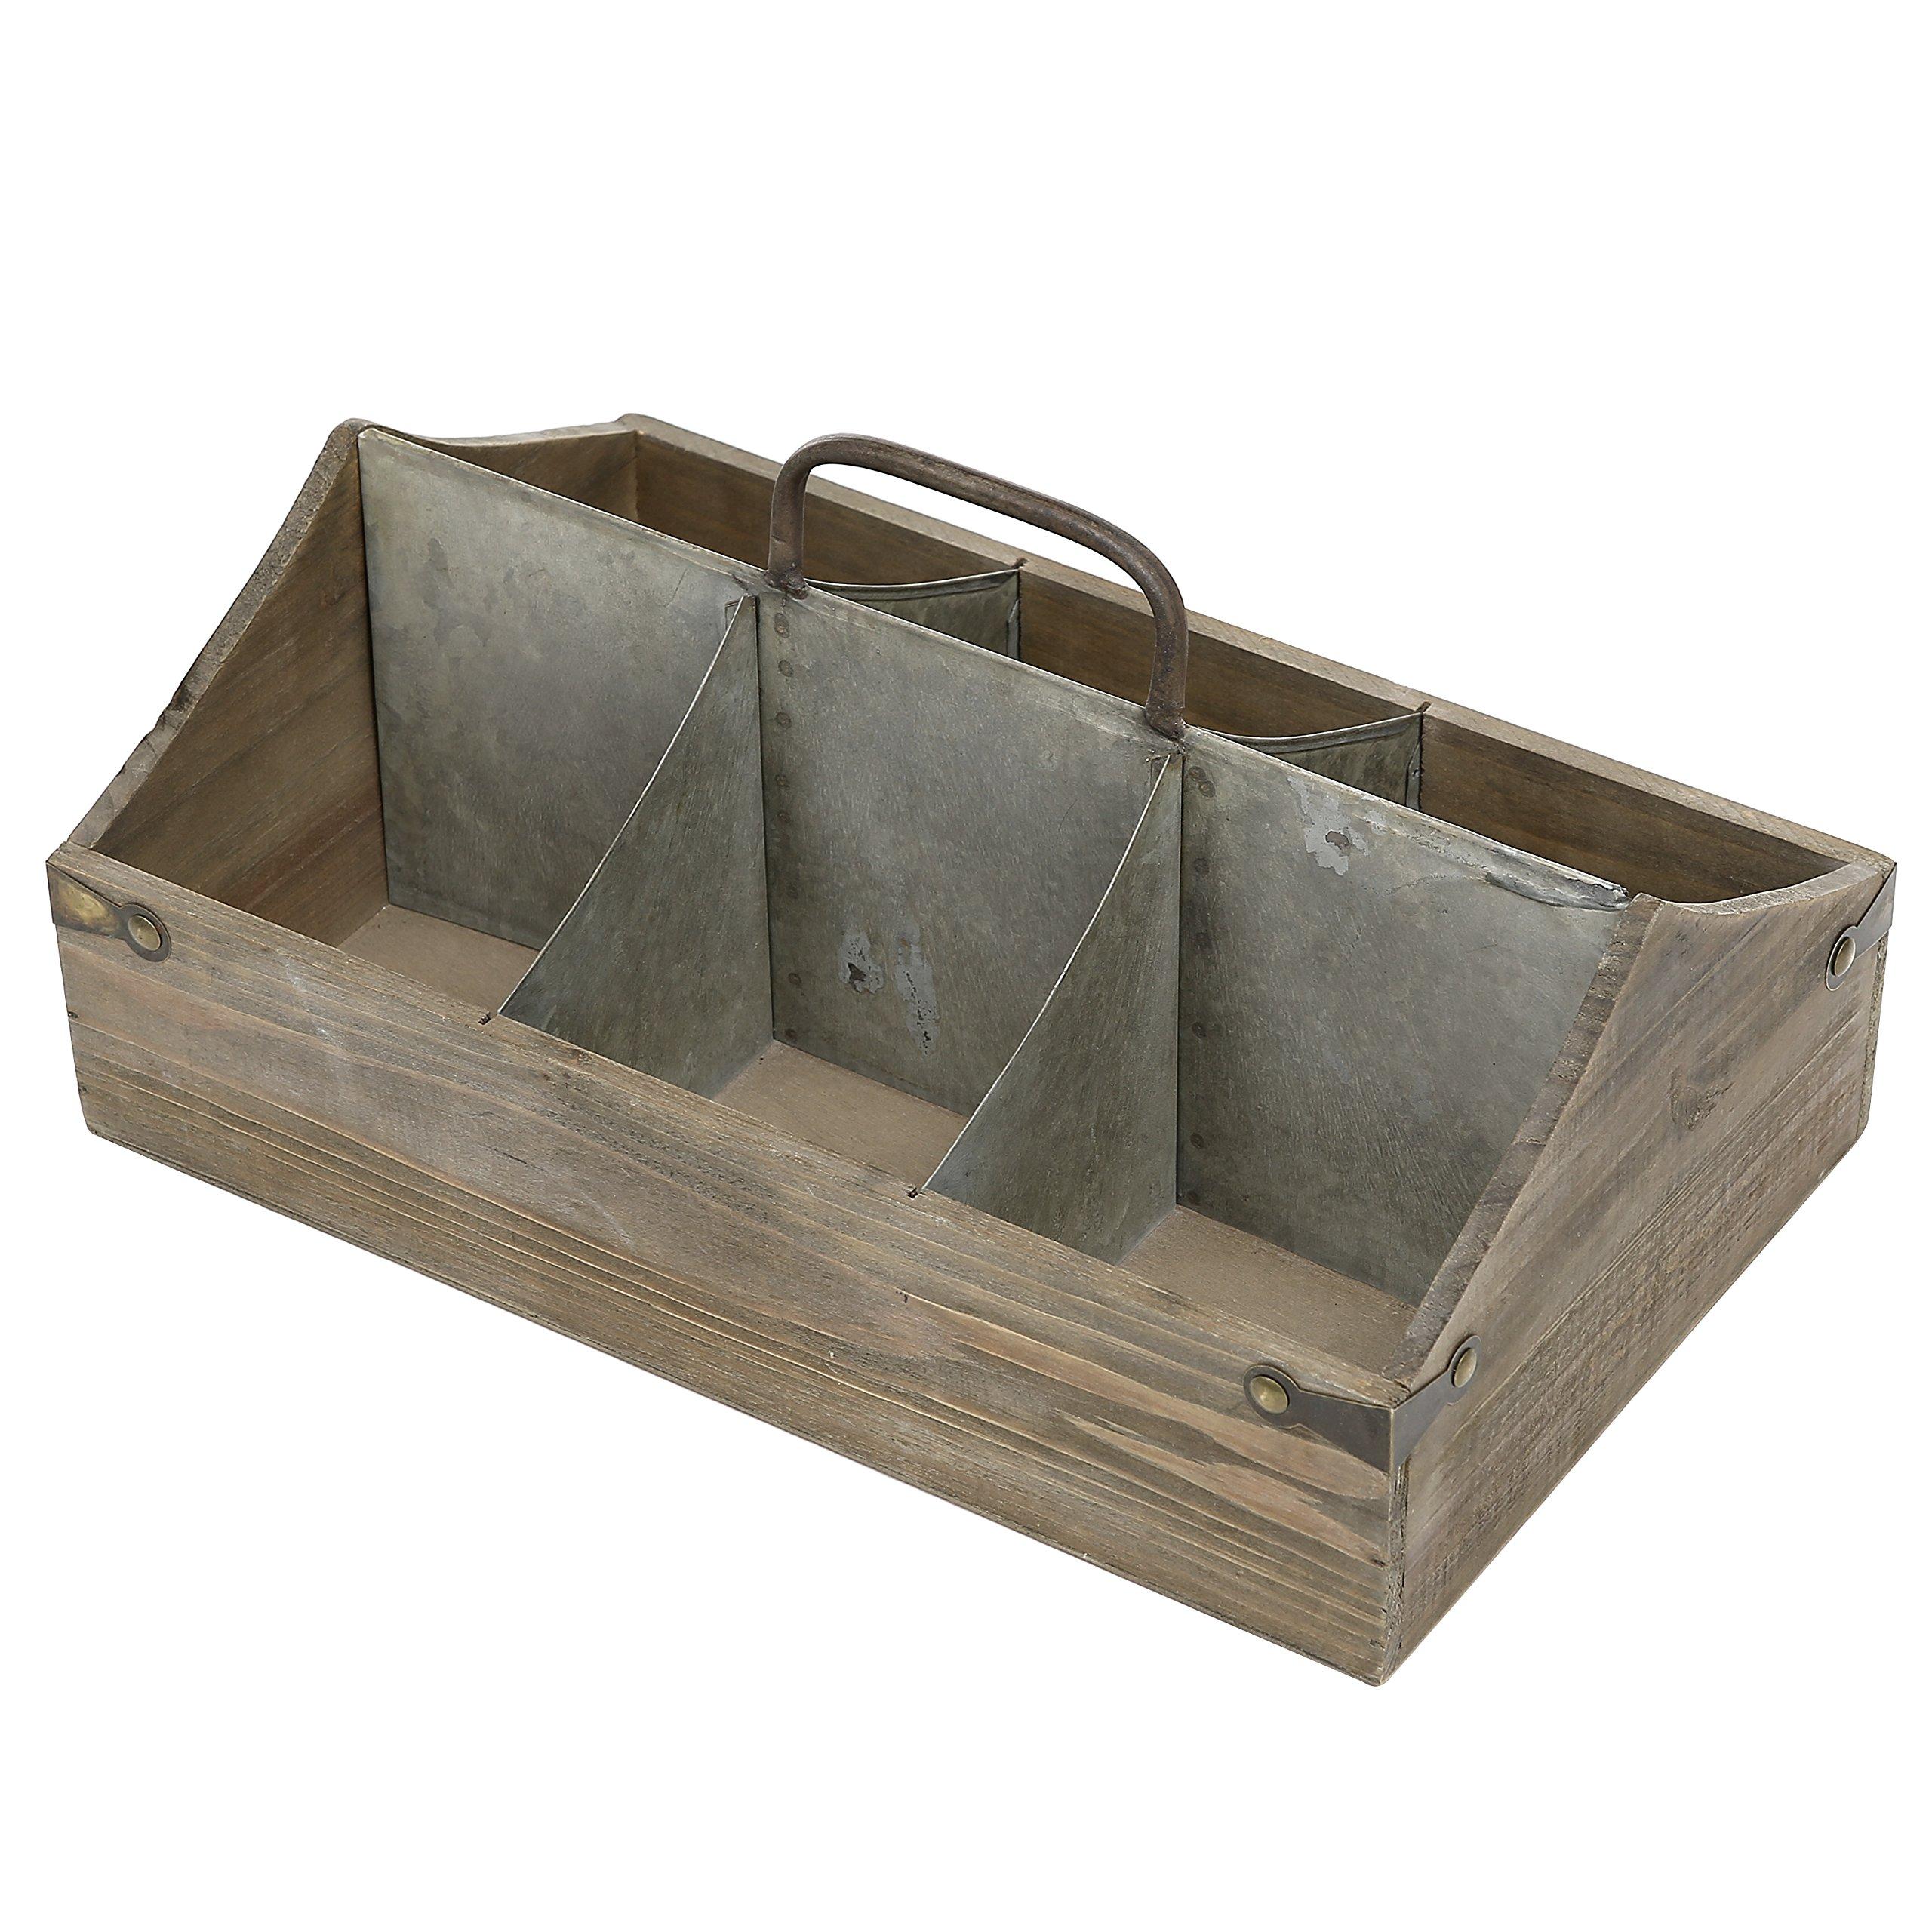 Vintage Wood Organizer Caddy, Decorative Storage Crate with Galvanized Zinc Metal Dividers & Handle